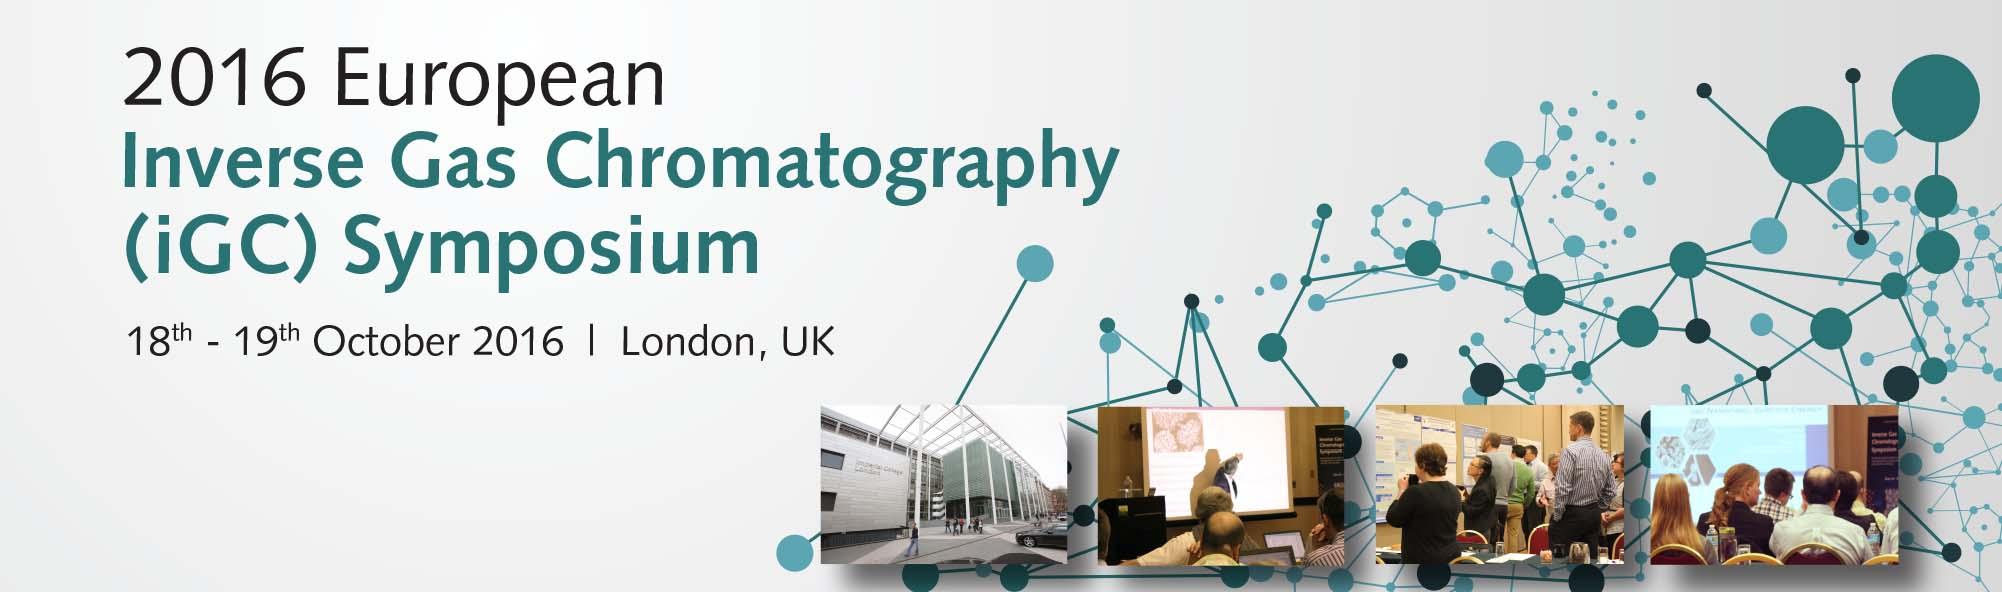 2016 European iCG Symposium Banner